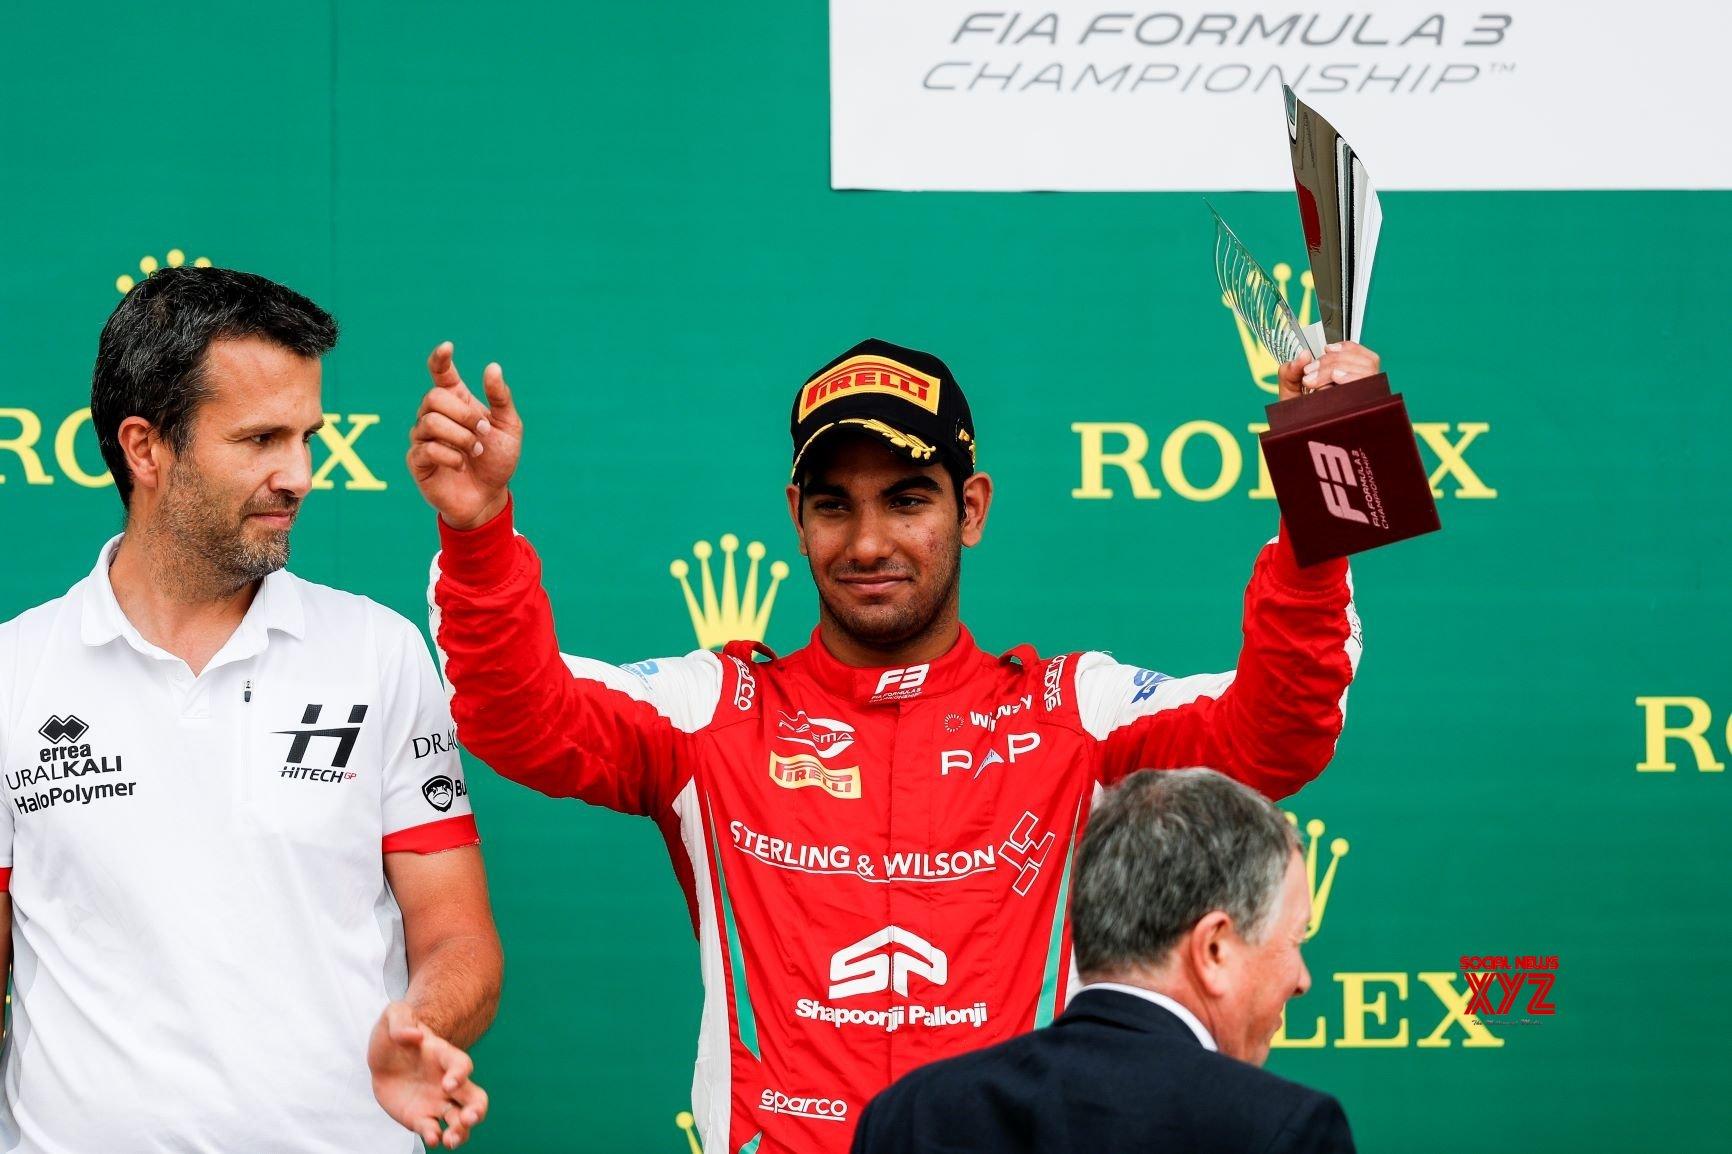 Jehan Daruvala clinches podium in Silverstone